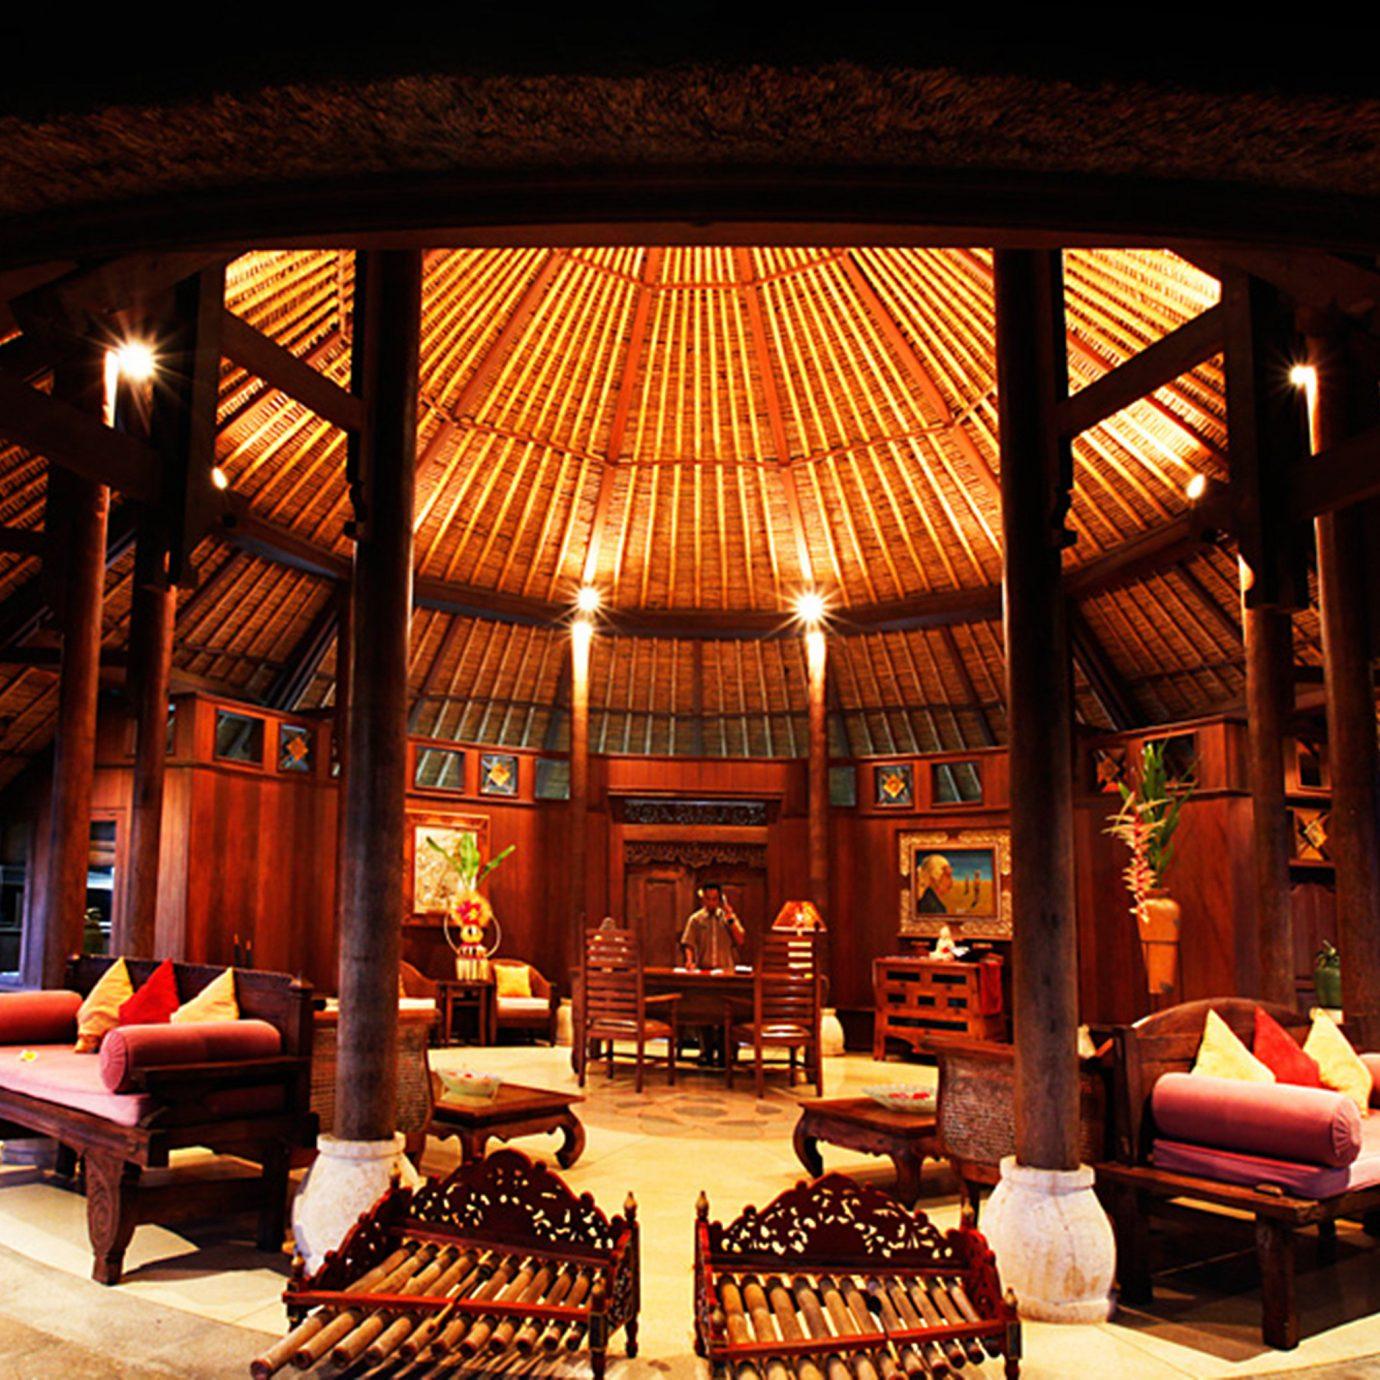 Jungle Lounge Luxury chair building lighting restaurant Lobby